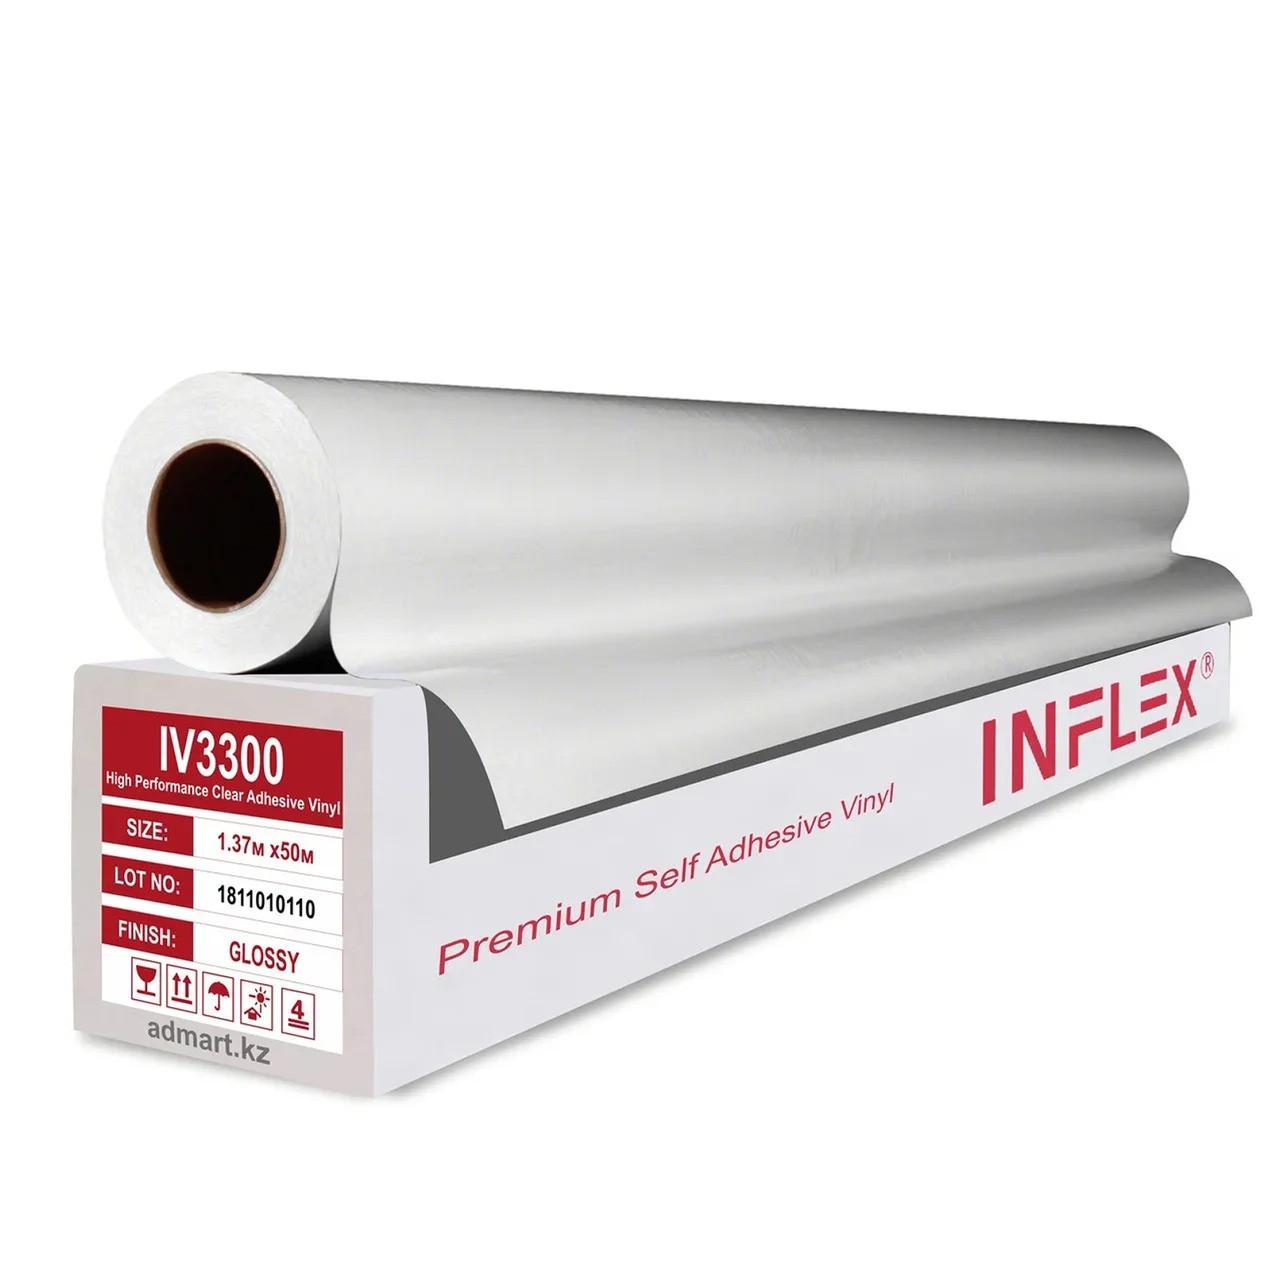 INFLEX PREMIUM 1,37мх50х 140g GLOSSY IV3300 POLYMERIC МЕТР